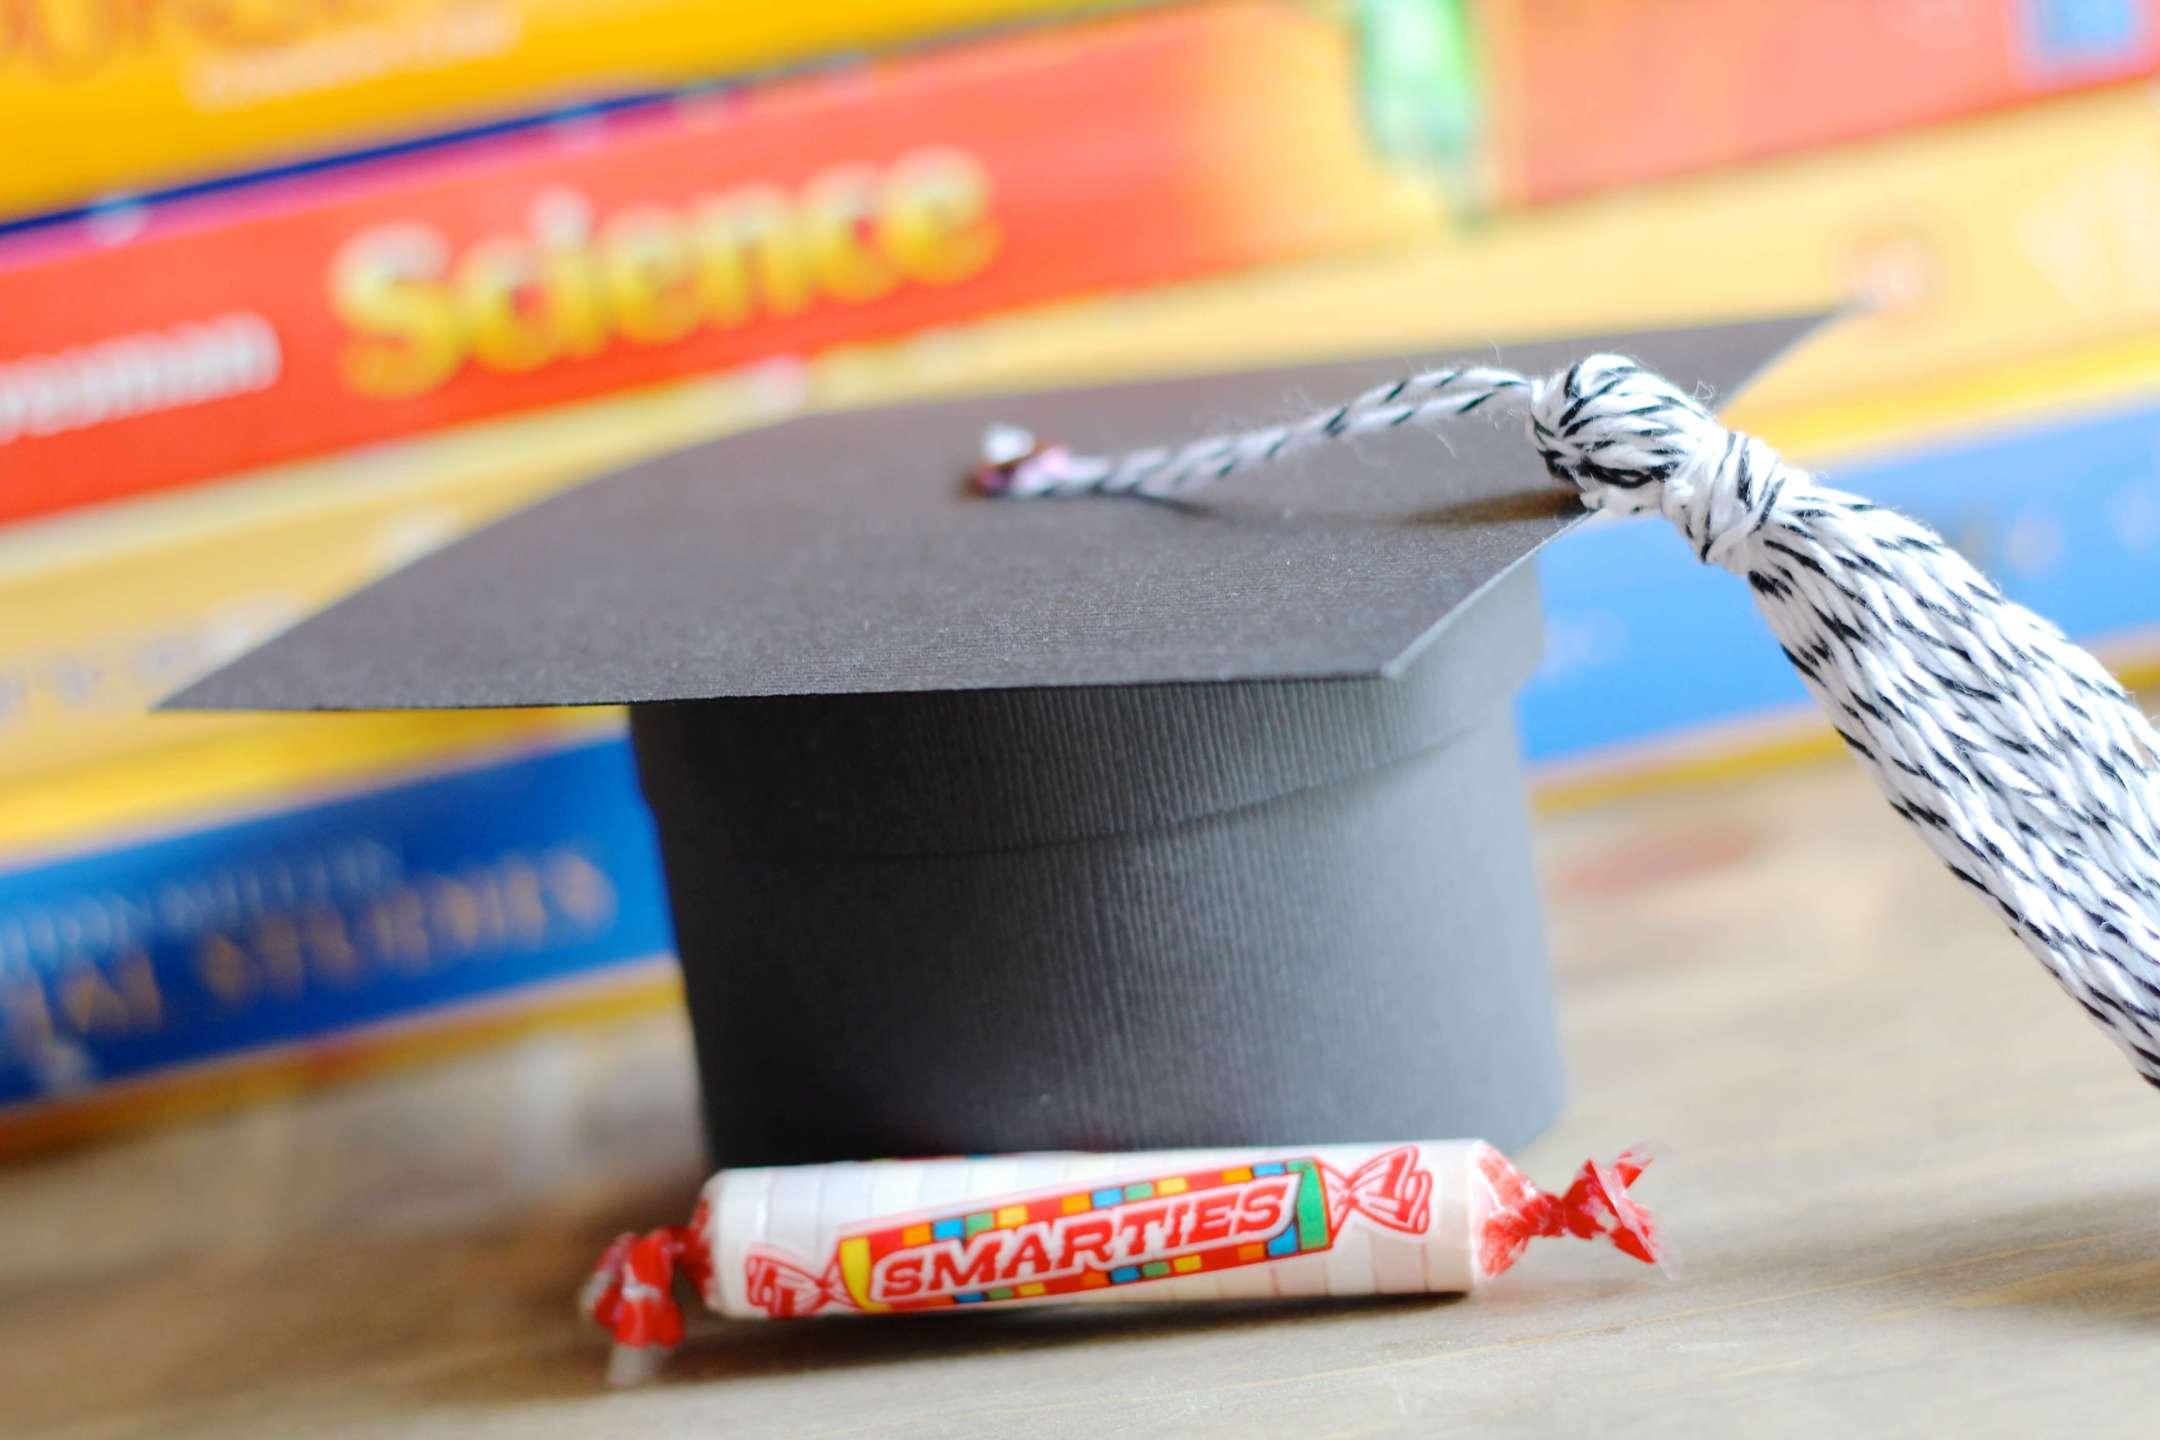 Graduation Cap Gift Box Smarties Candies School Books